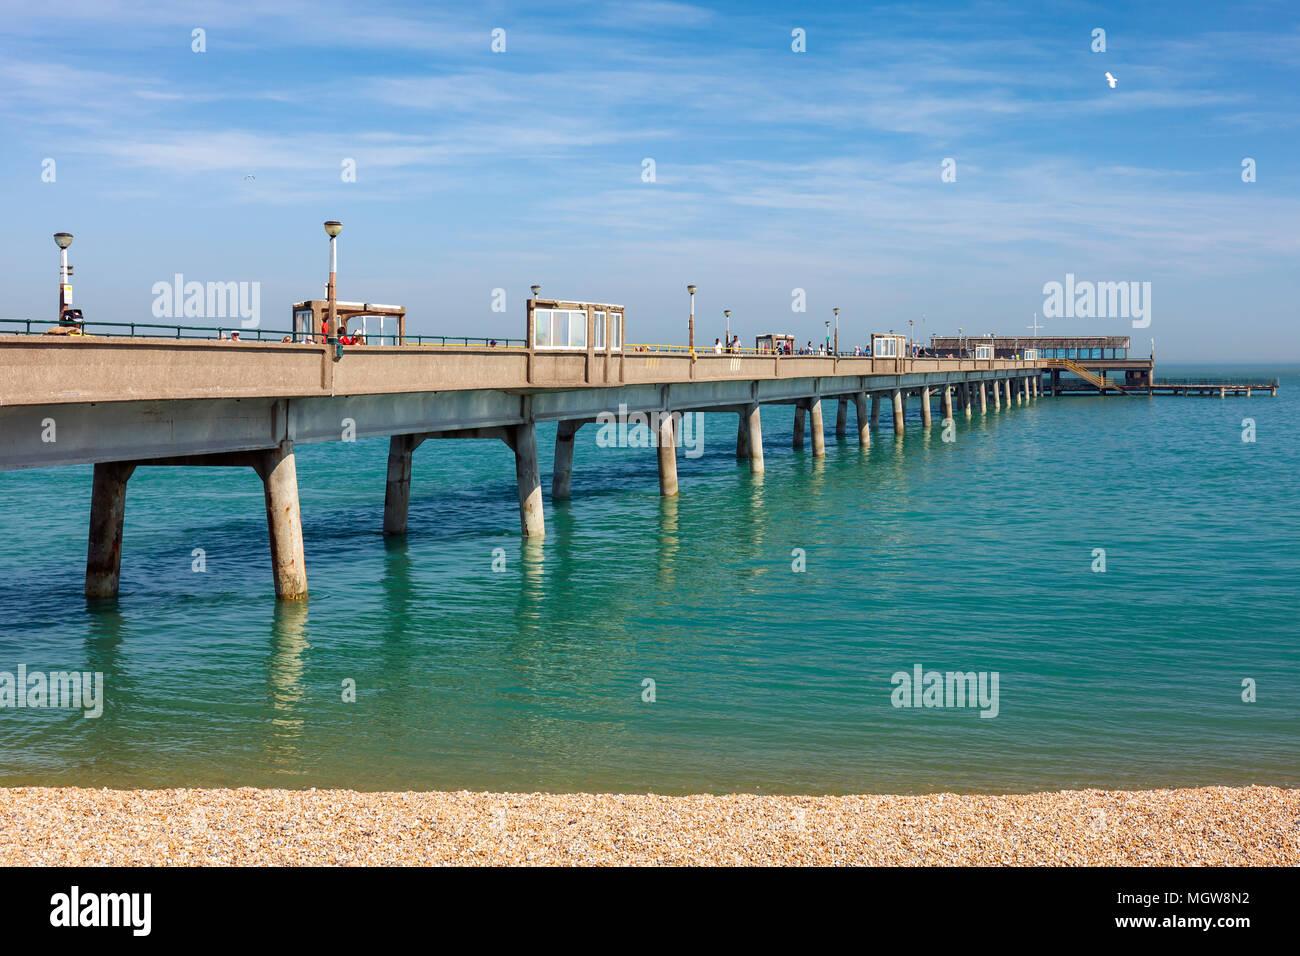 Deal pier, Kent. - Stock Image